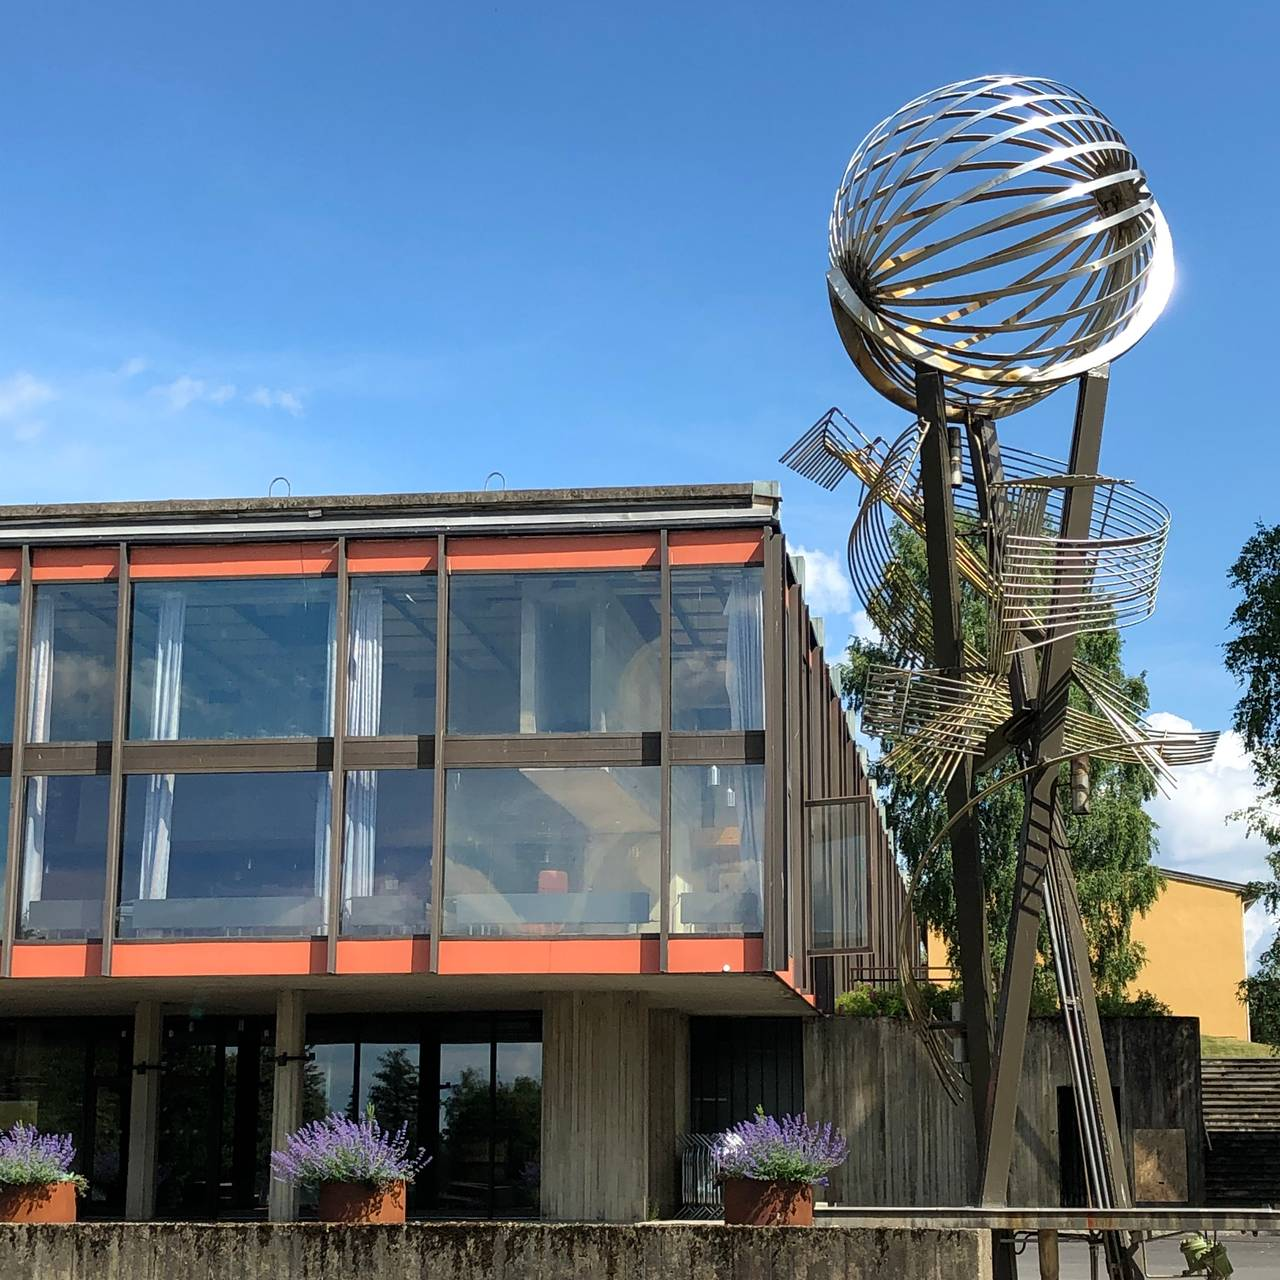 Carl Nesjars helsårsfontene/skulptur utenfor Auditorium Maximum i Ås